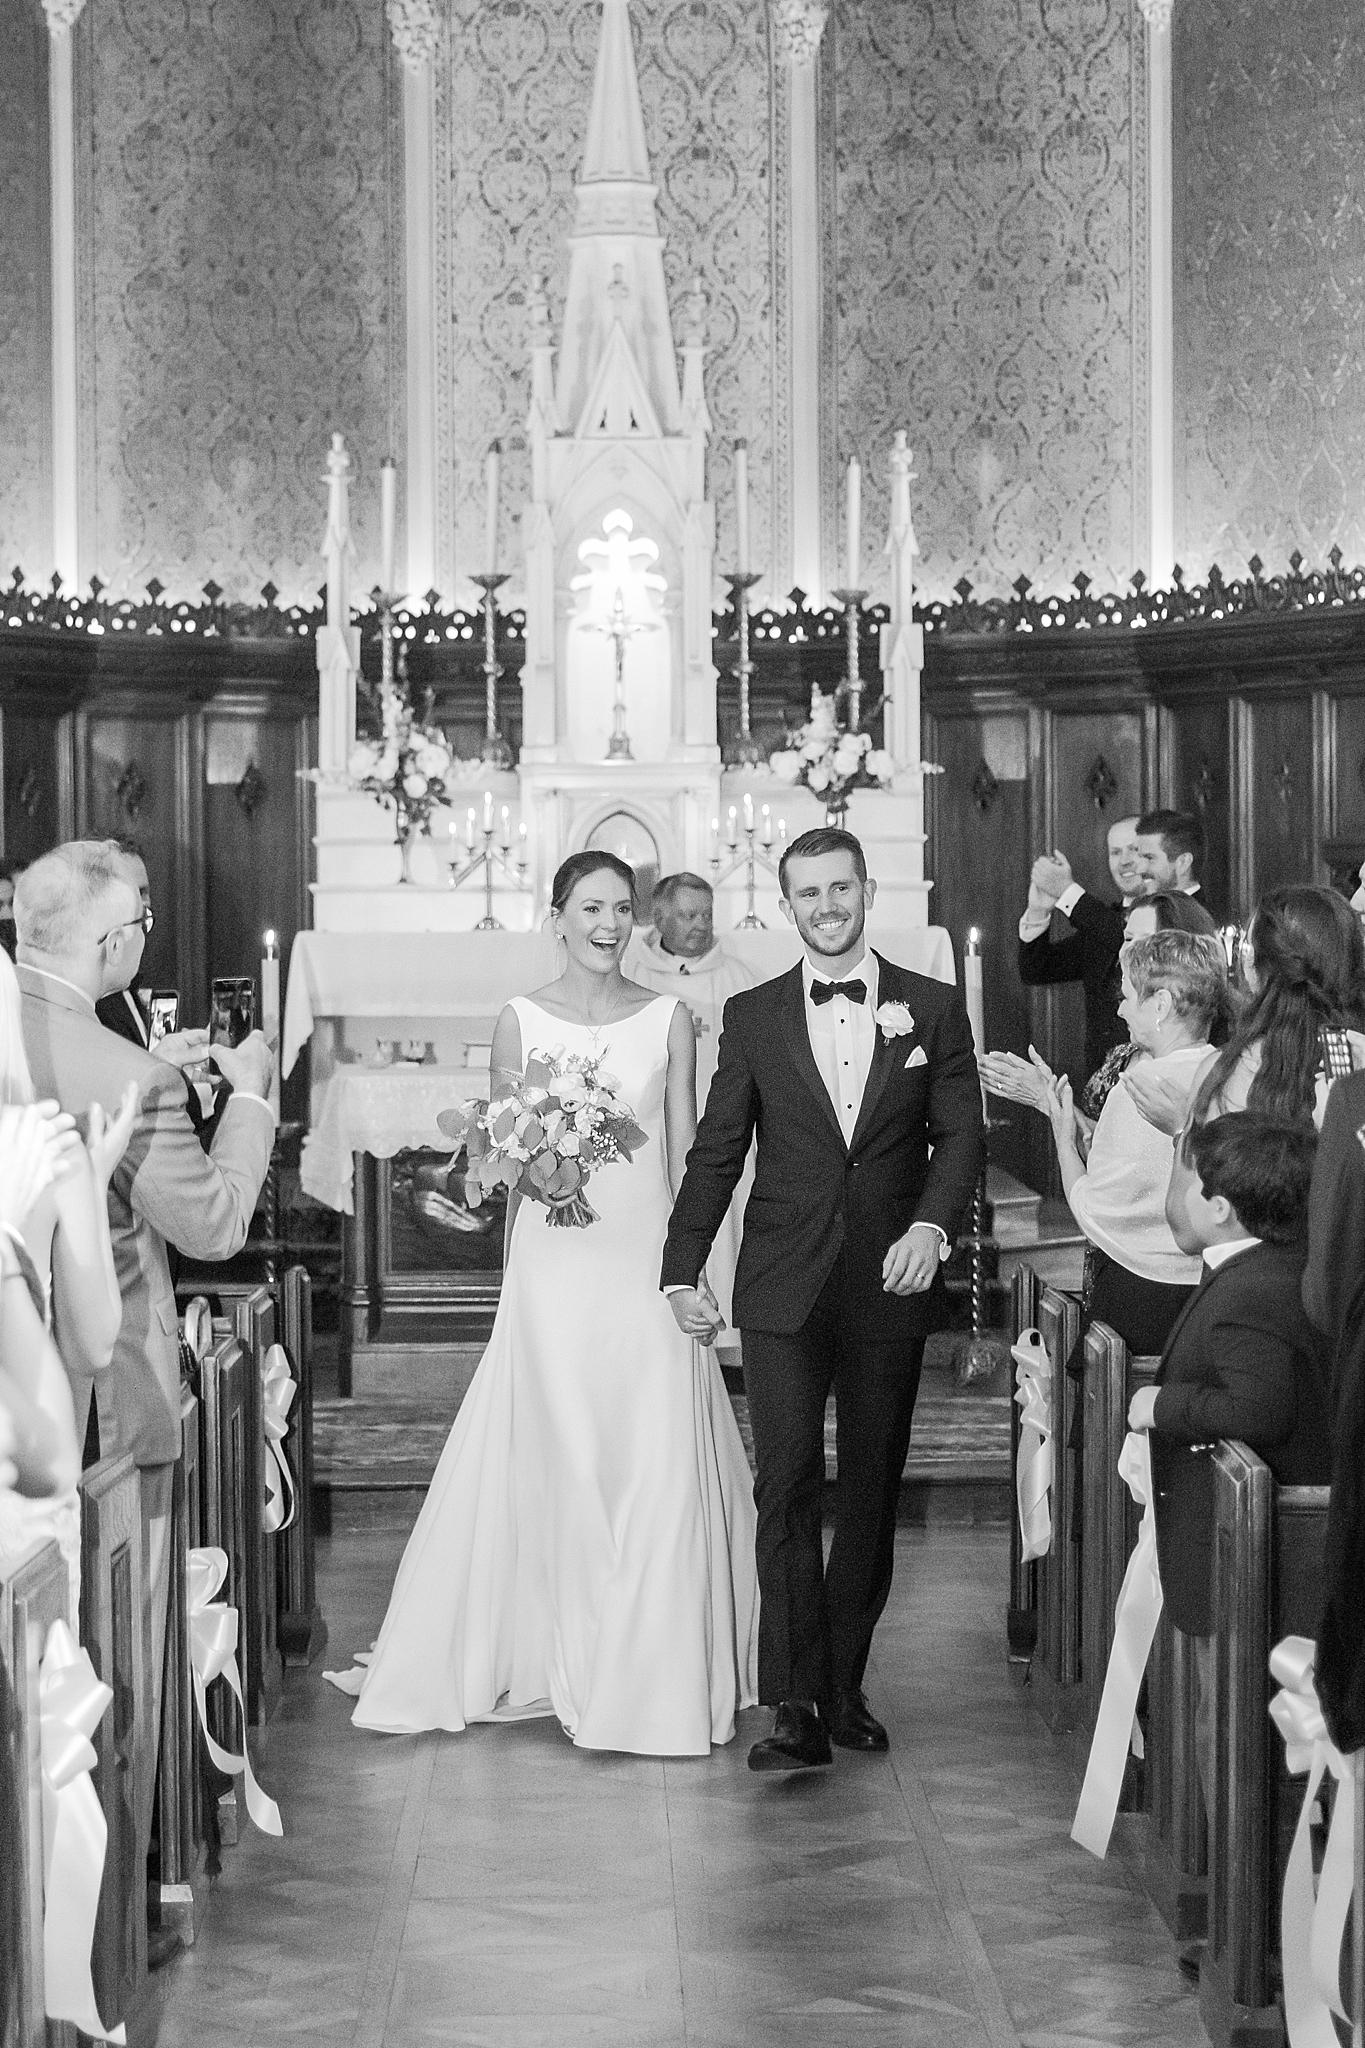 detroit-wedding-photographer-grosse-pointe-academy-chapel-detroit-golf-club-wedding-carly-matt-by-courtney-carolyn-photography_0052.jpg